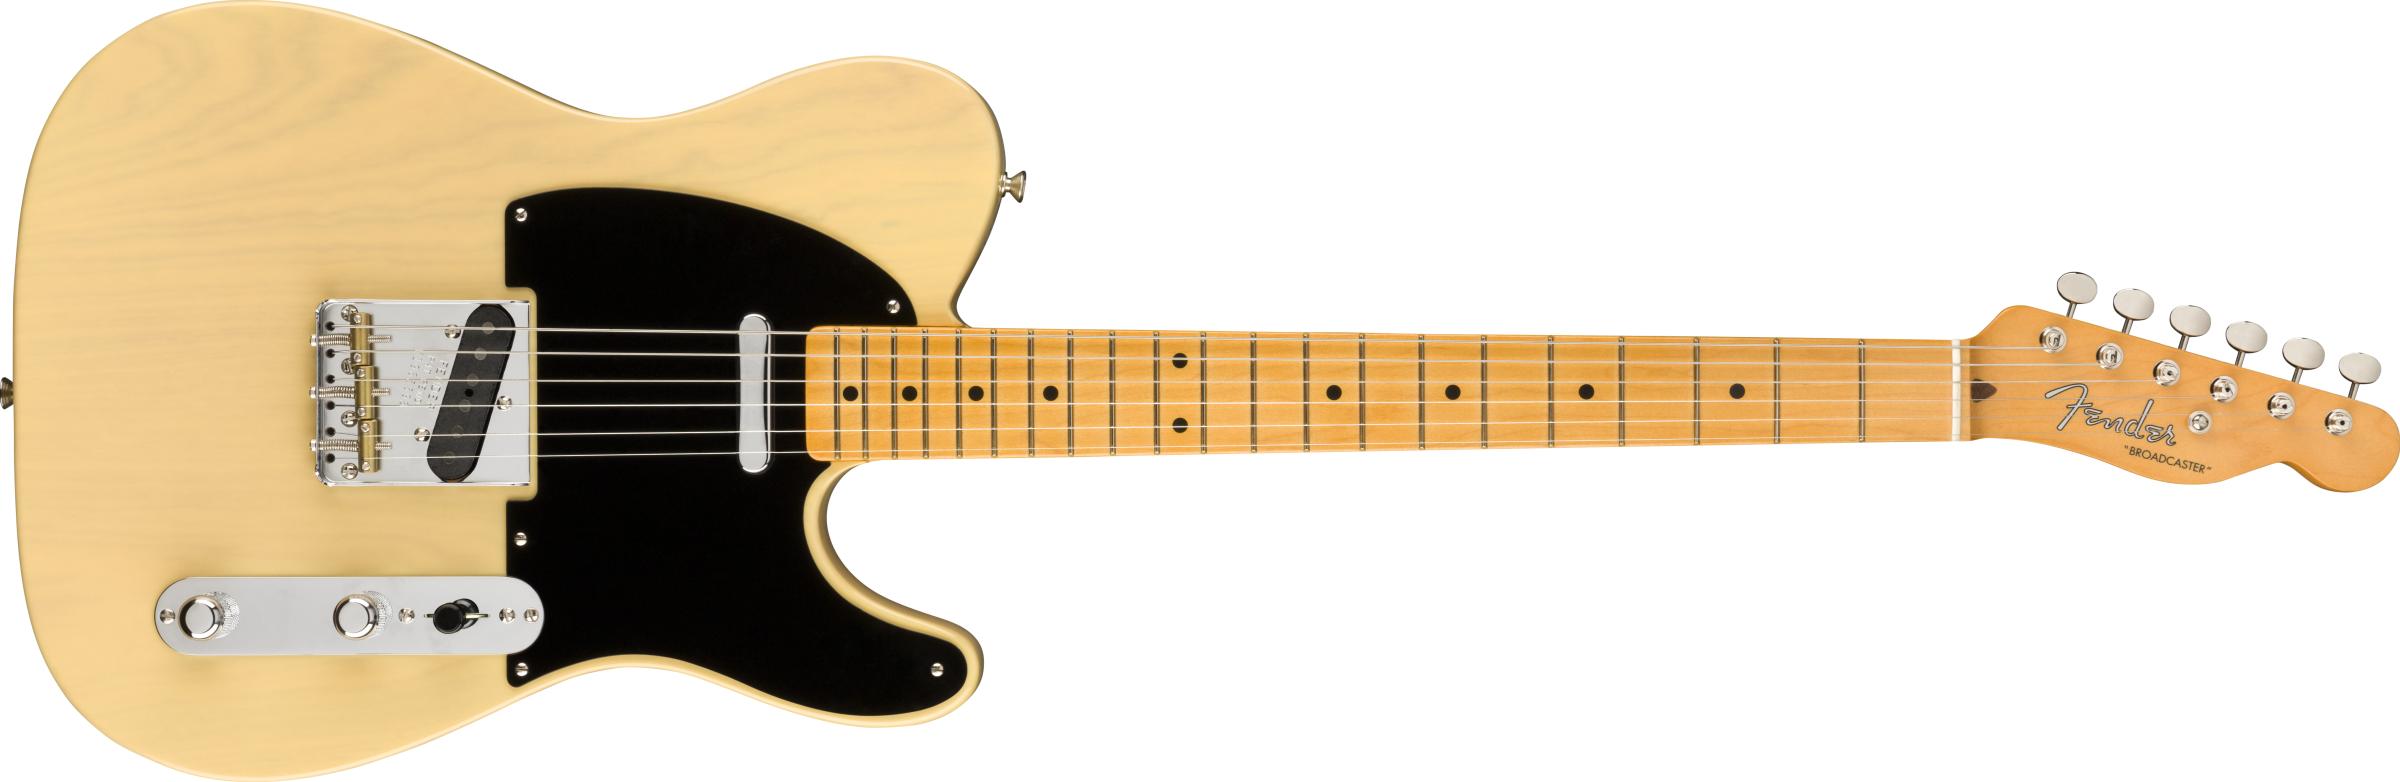 Fender 70th Ann. Broadcaster Maple Blackguard Blonde